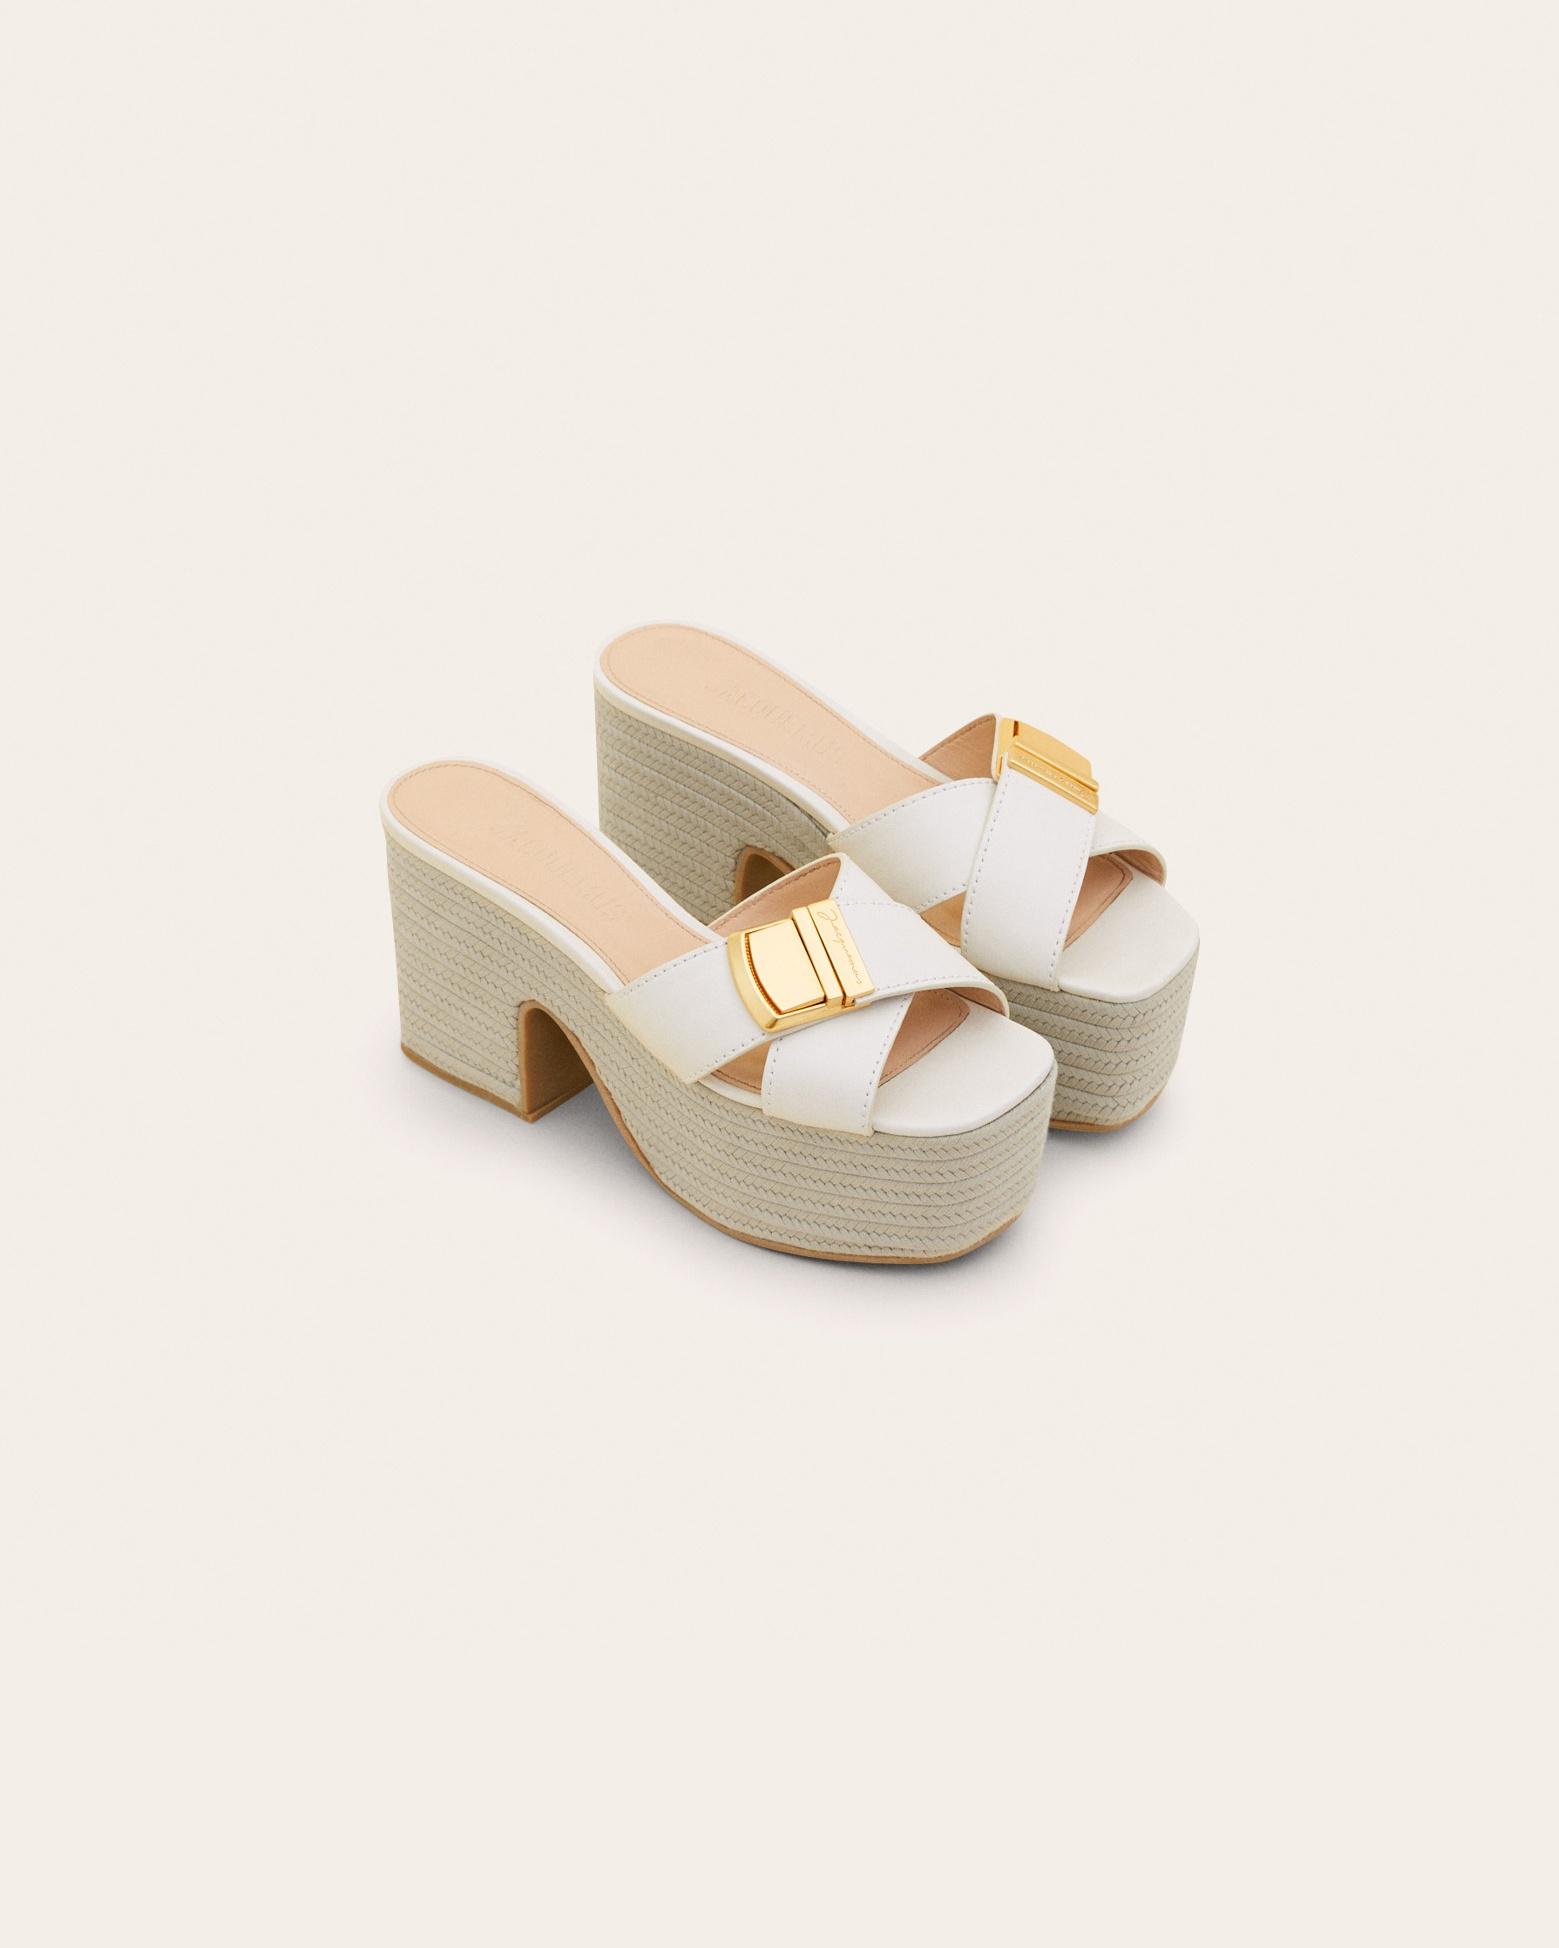 Les sandales Tatanes